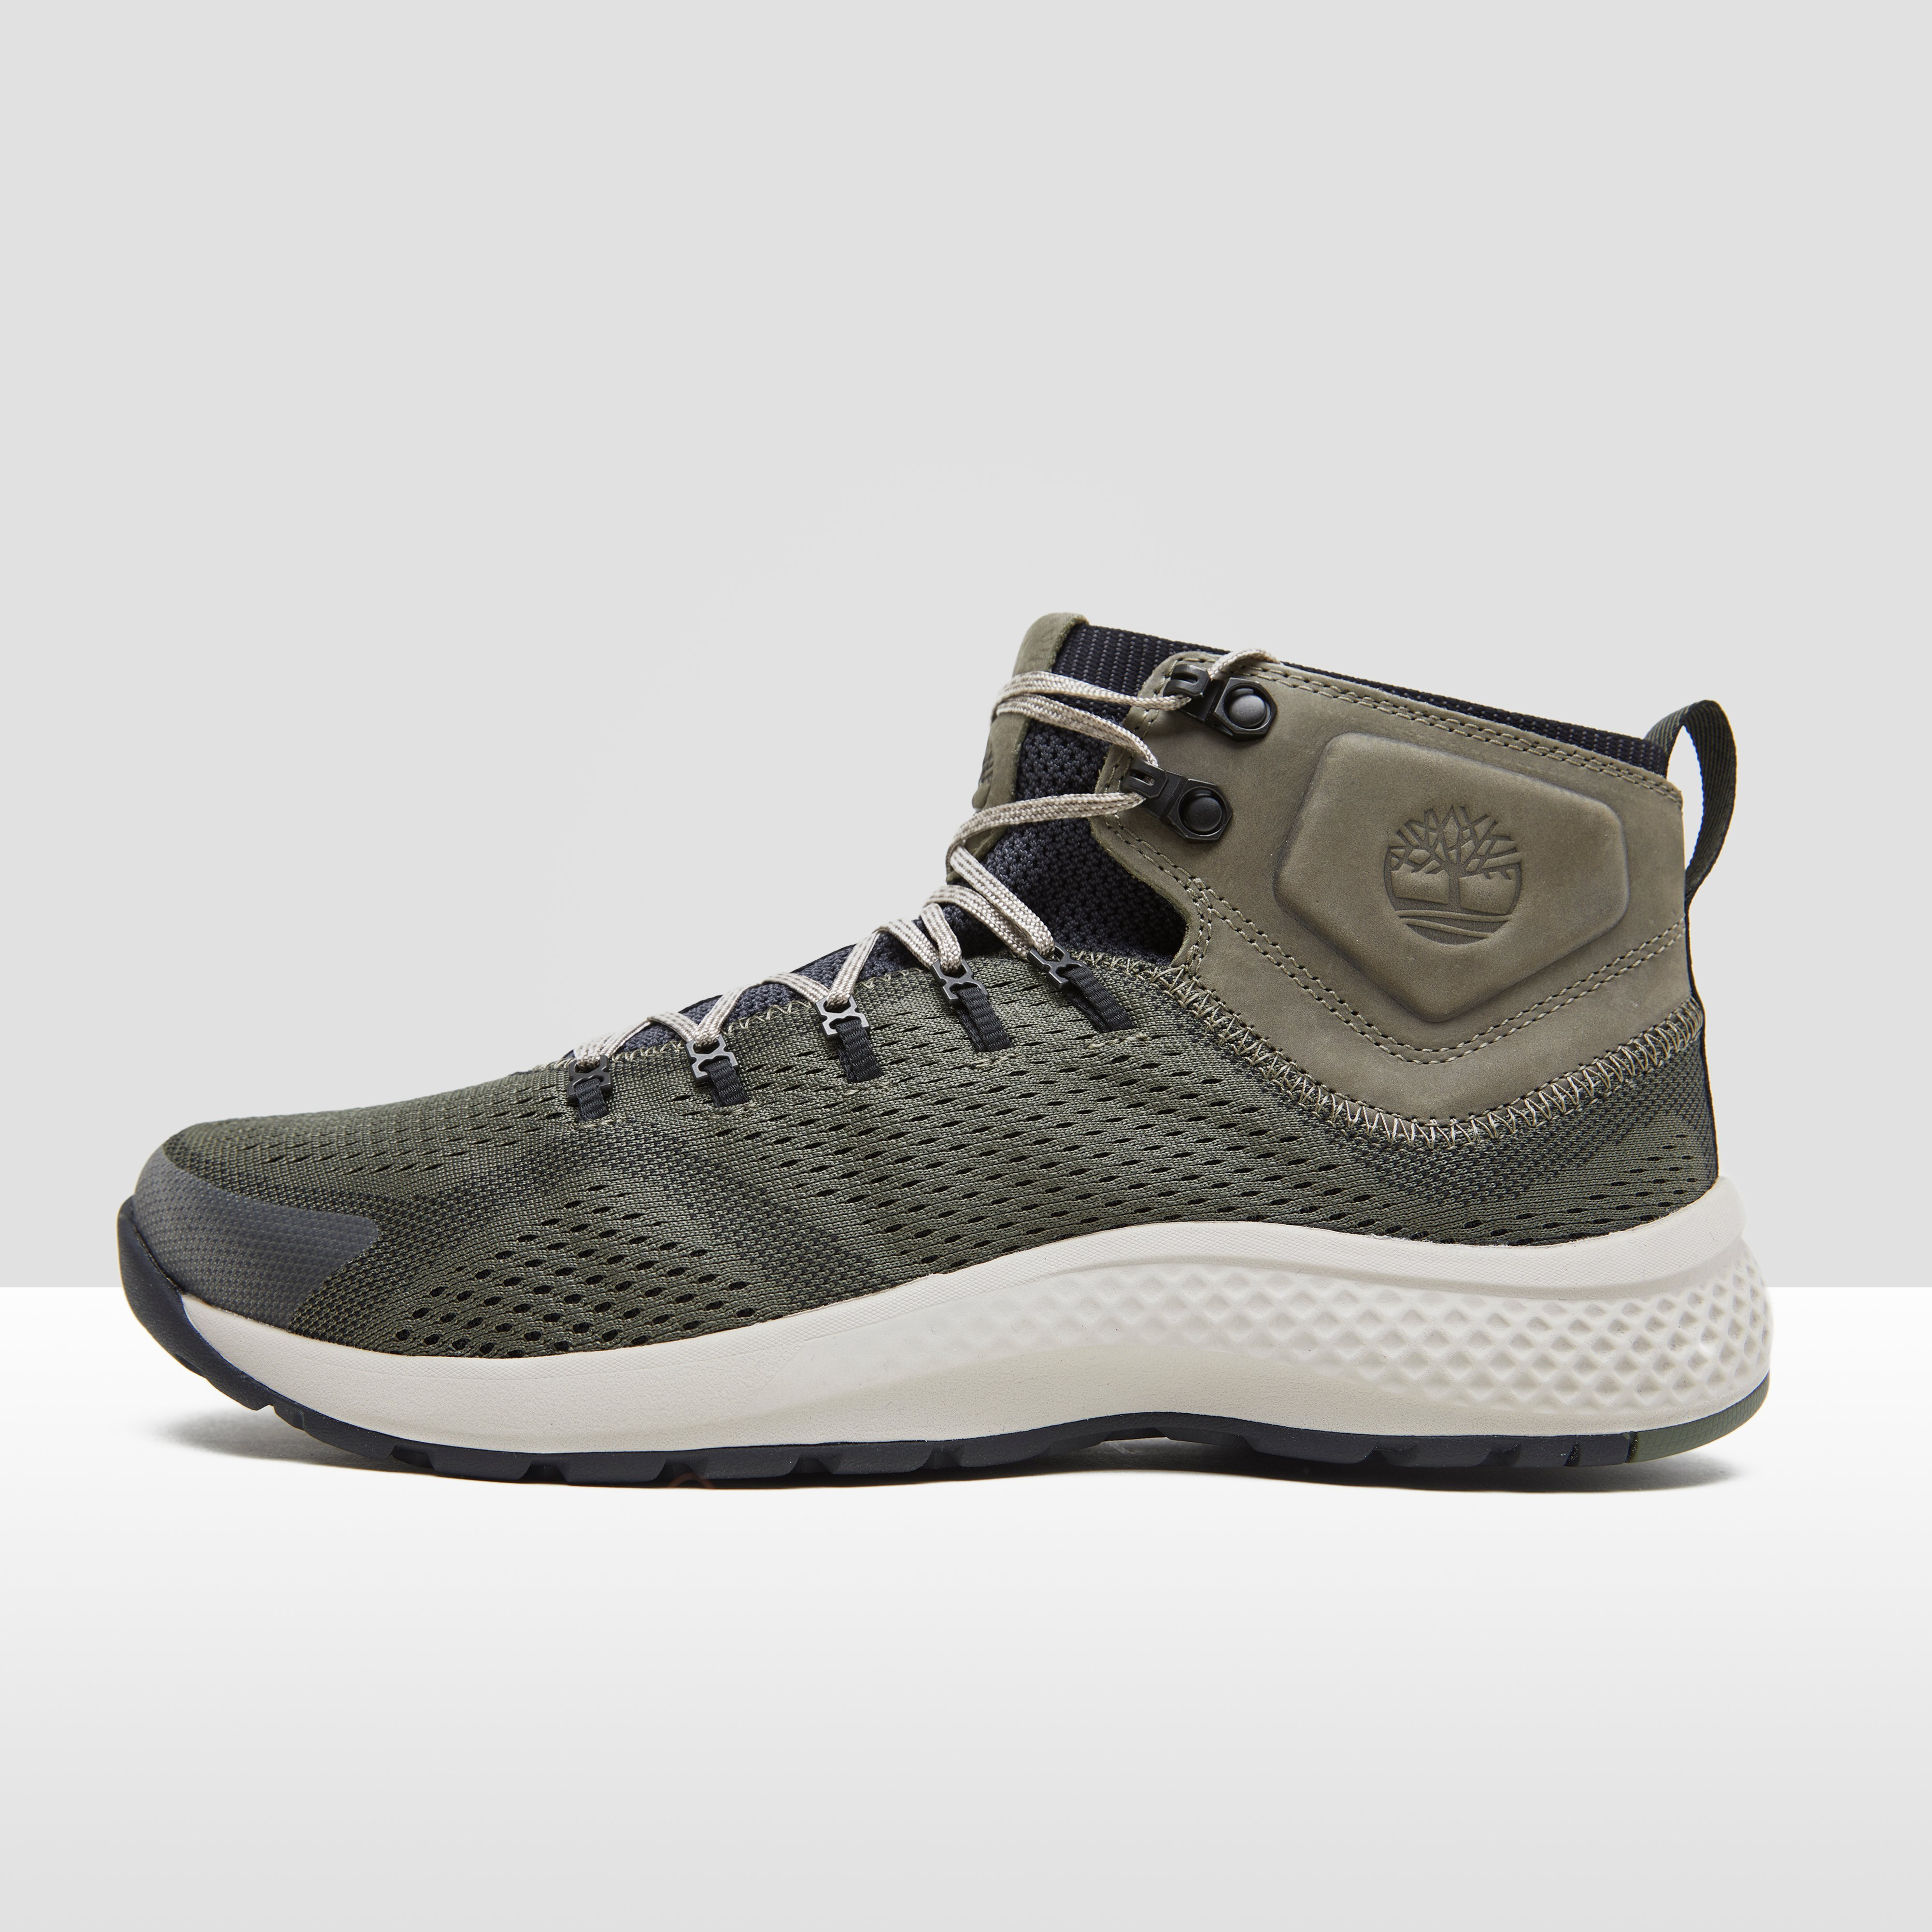 Chaussures Vertes Flyroam Timberland Pour Les Hommes 8ccmh